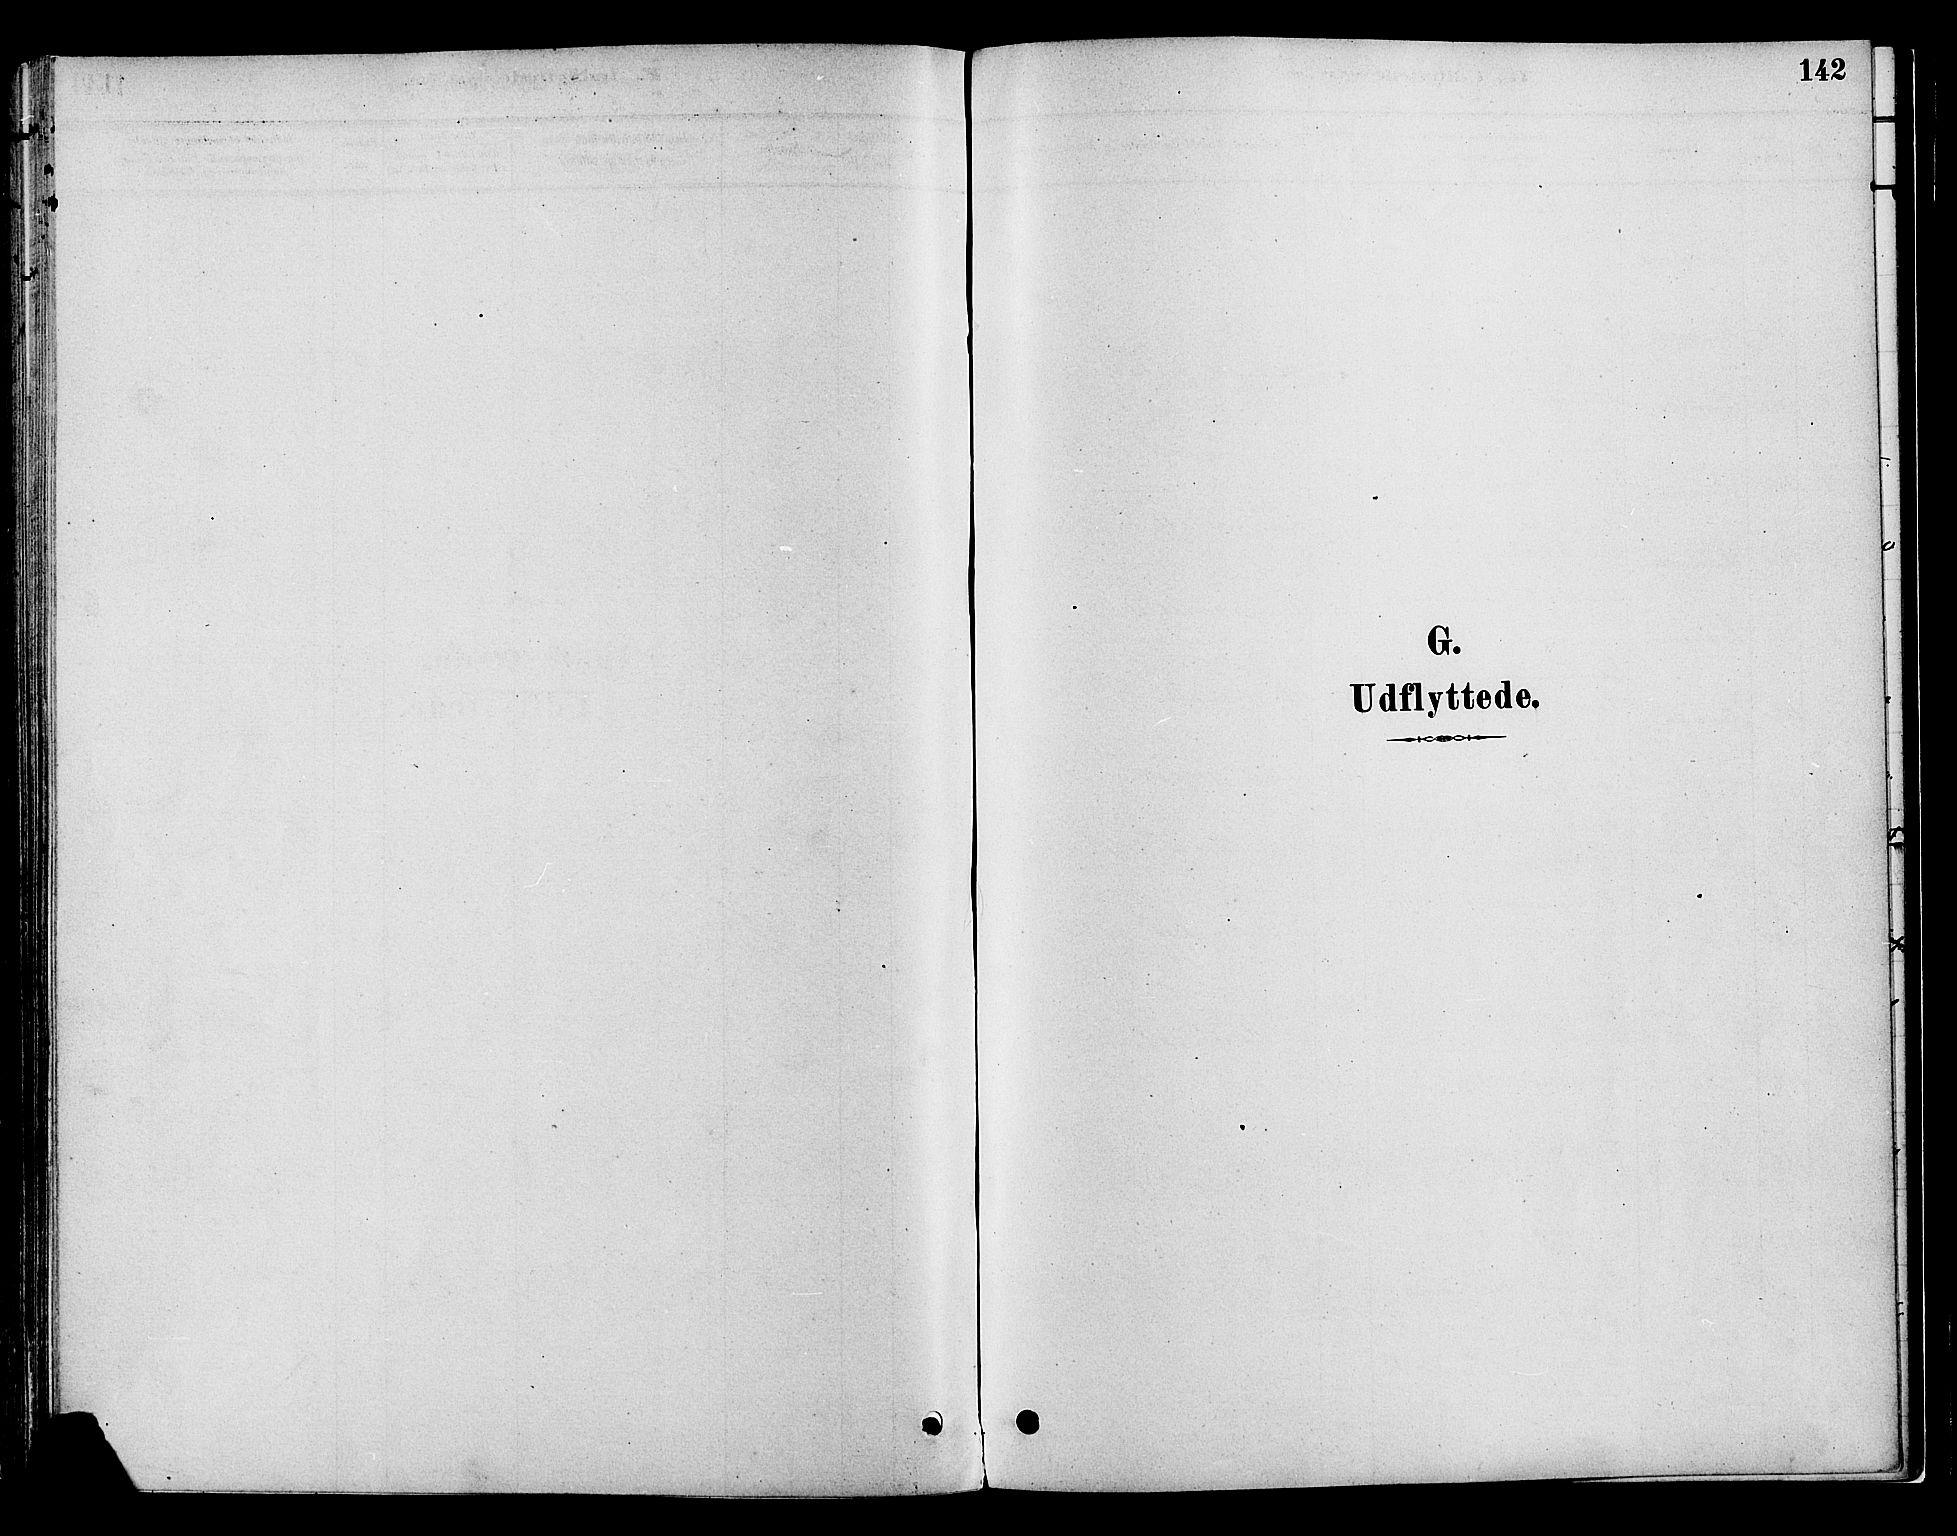 SAH, Gran prestekontor, Parish register (official) no. 16, 1880-1888, p. 142